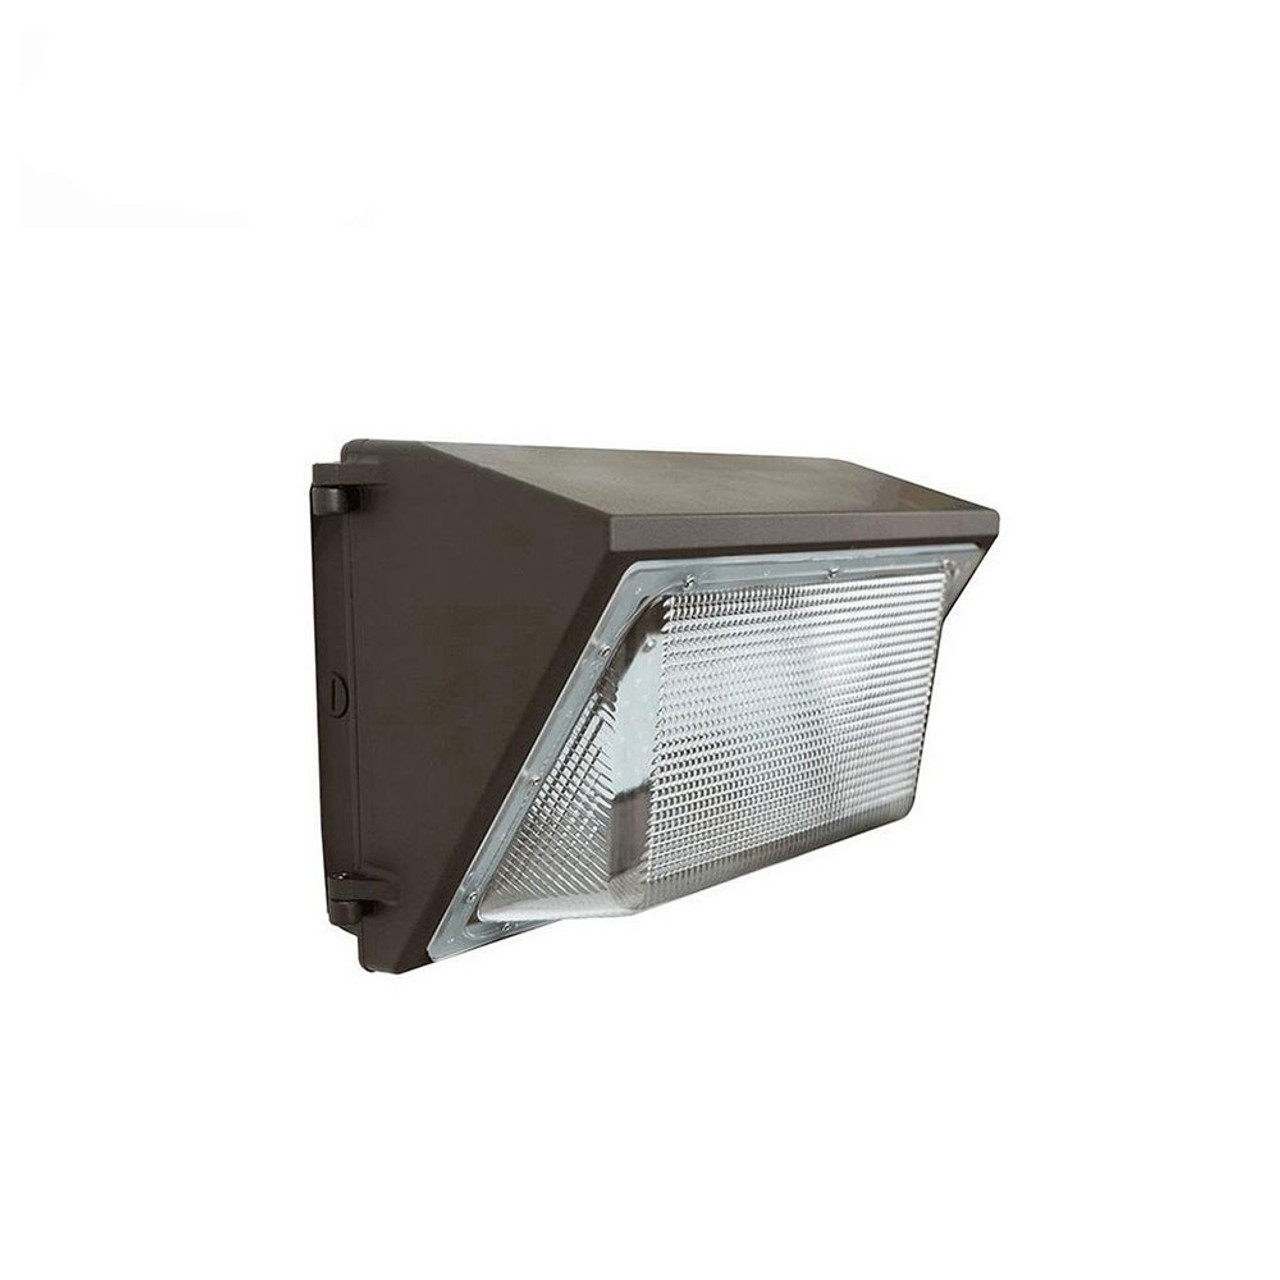 LED Wall Pack, 60 Watt, 7000 lumen, 5000 Kelvin, 100-277 volt, UL and DLC Listed